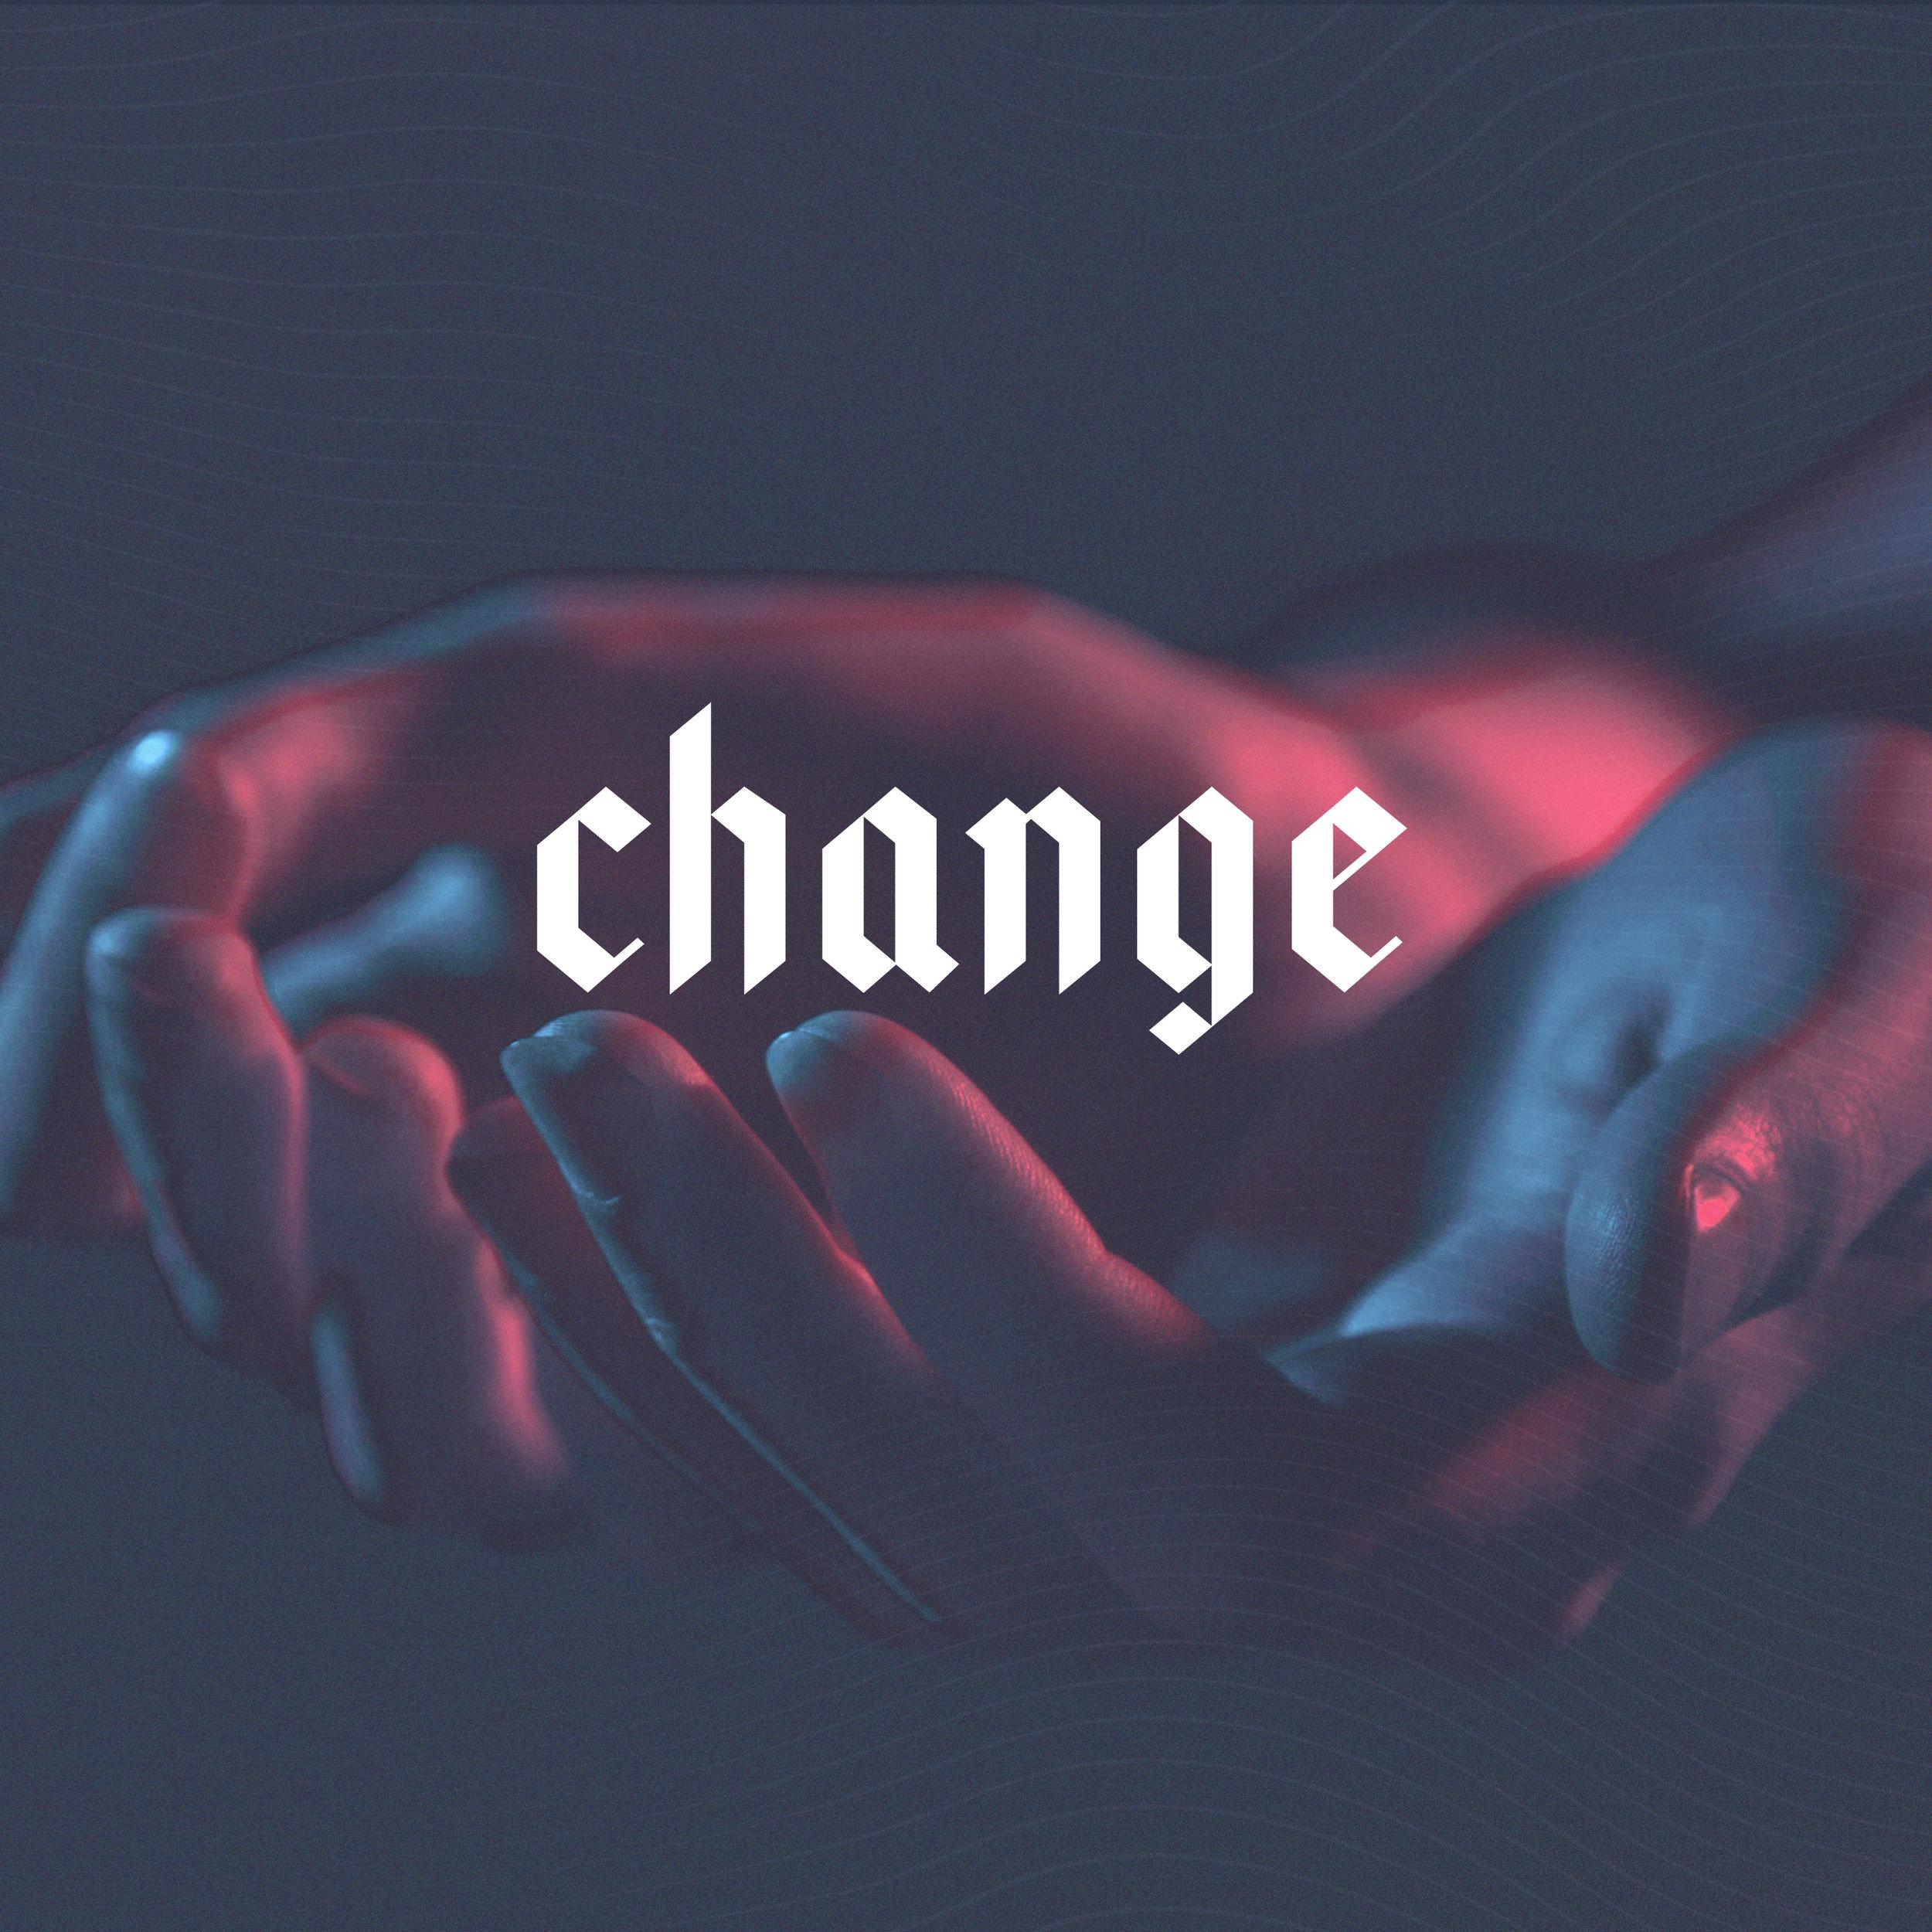 Change_SquareTitle_Grow.jpg